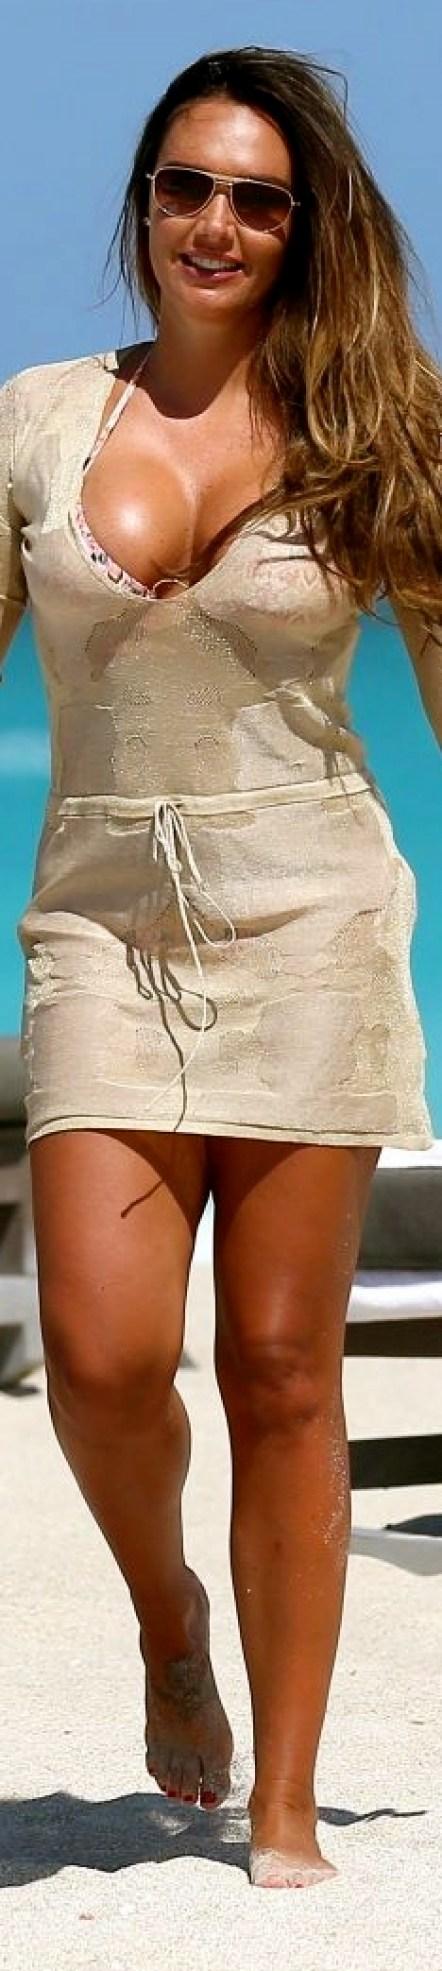 Hot-trend-Beachwear-1